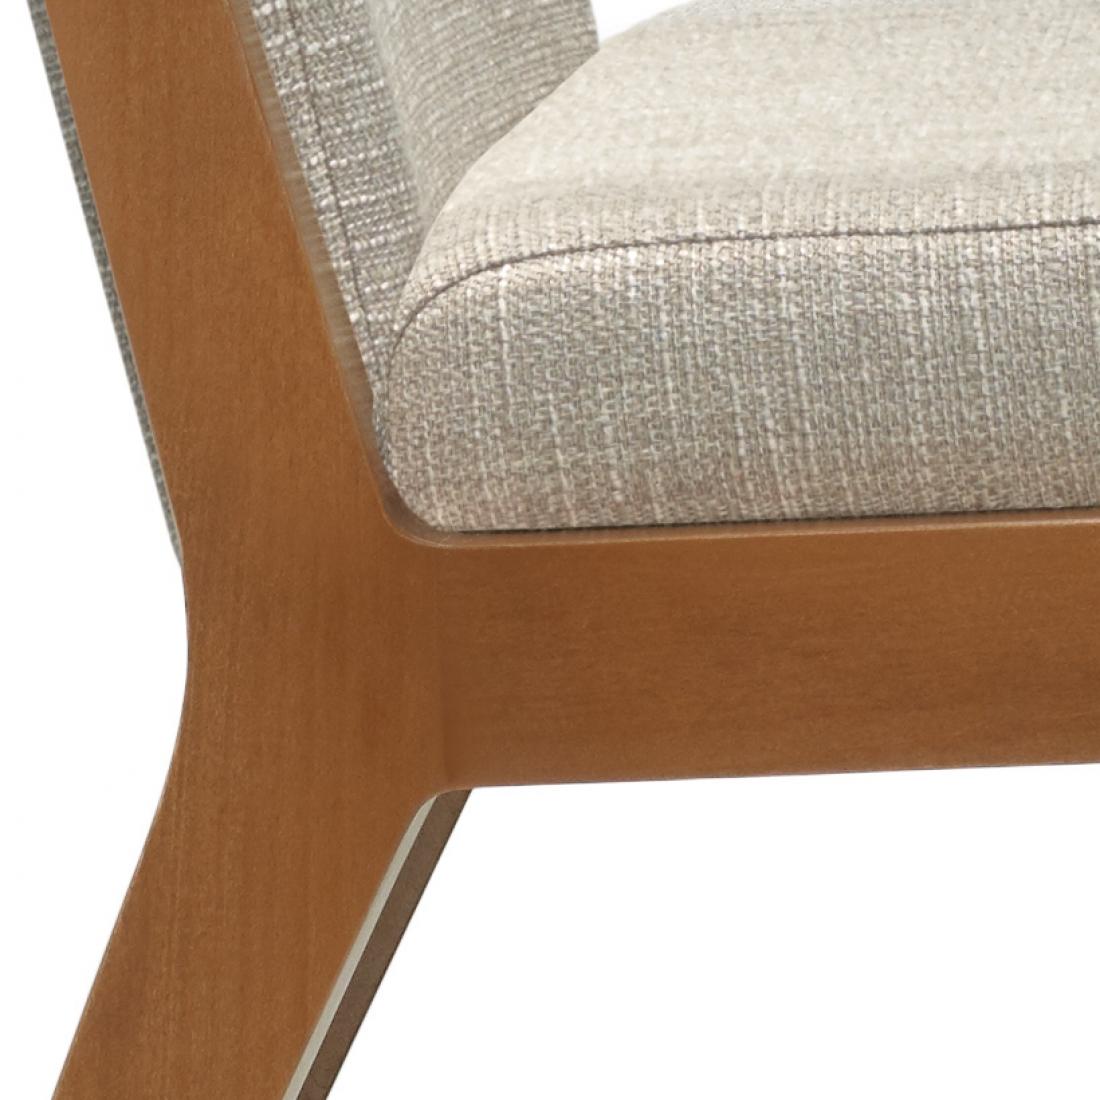 chap armchair 1015 frame detail